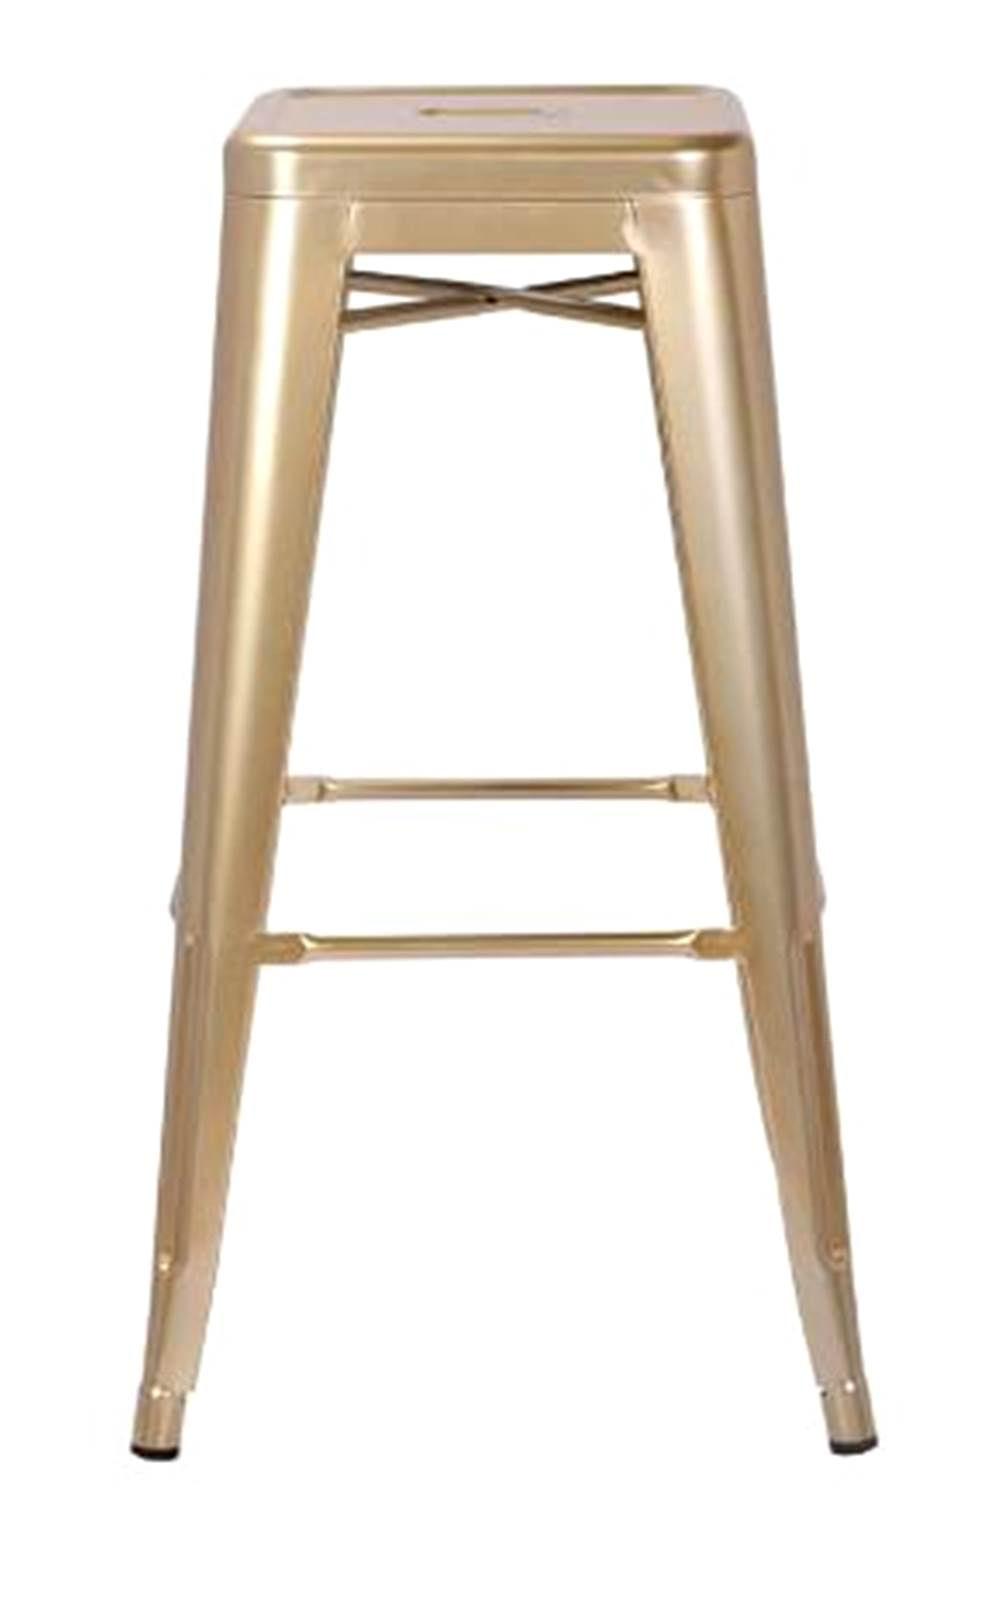 Banqueta Iron Tolix Dourado 77 cm (ALT) - 44067